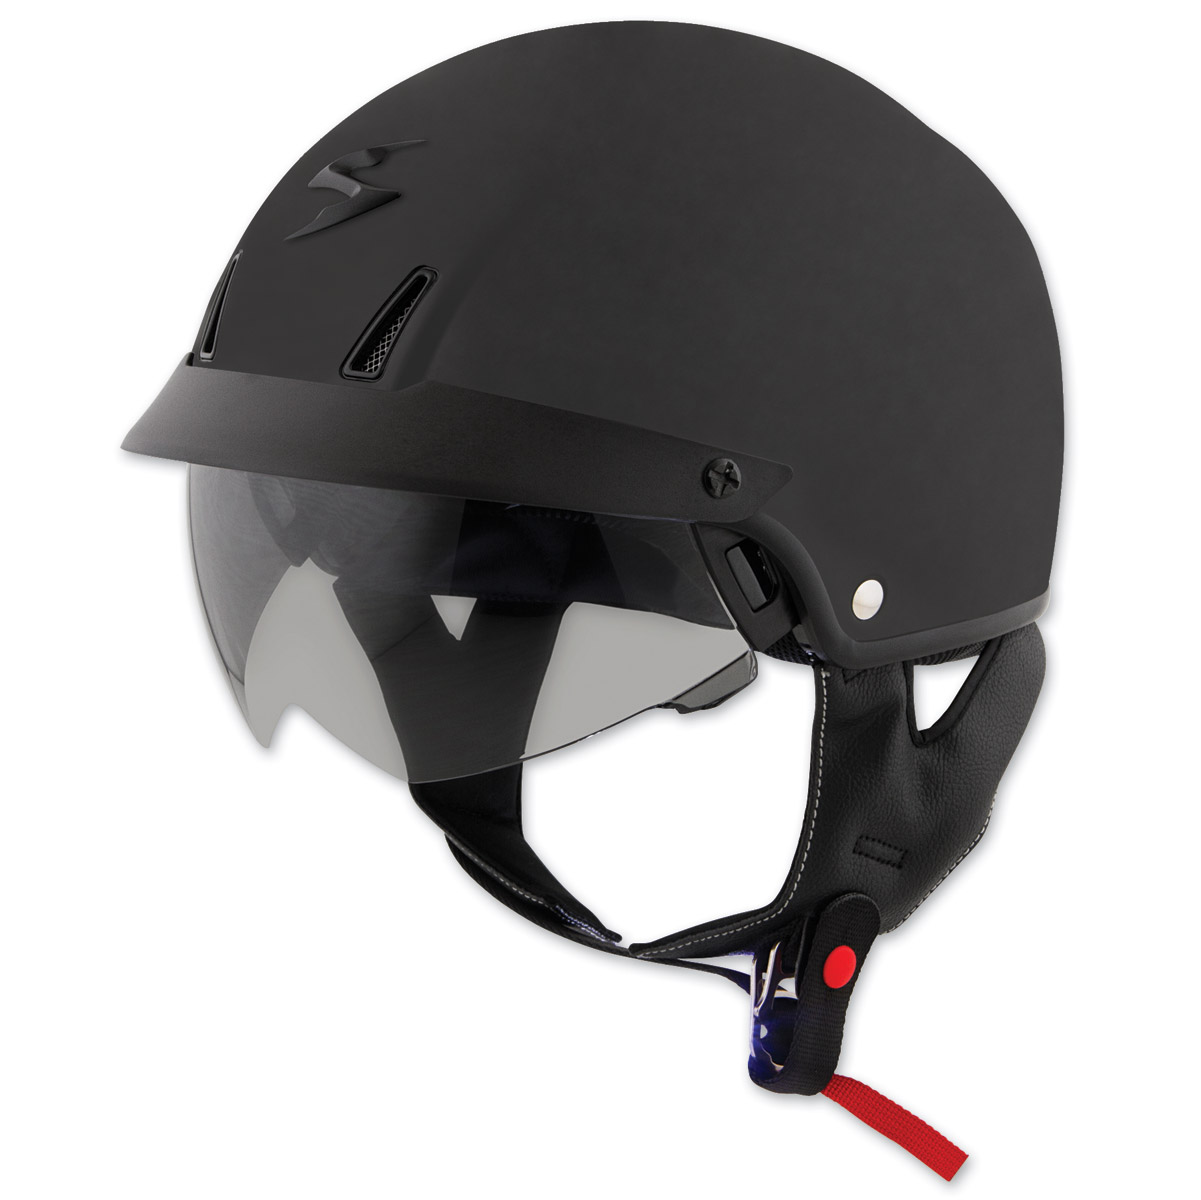 scorpion exo c110 matte black half helmet c11 0106. Black Bedroom Furniture Sets. Home Design Ideas